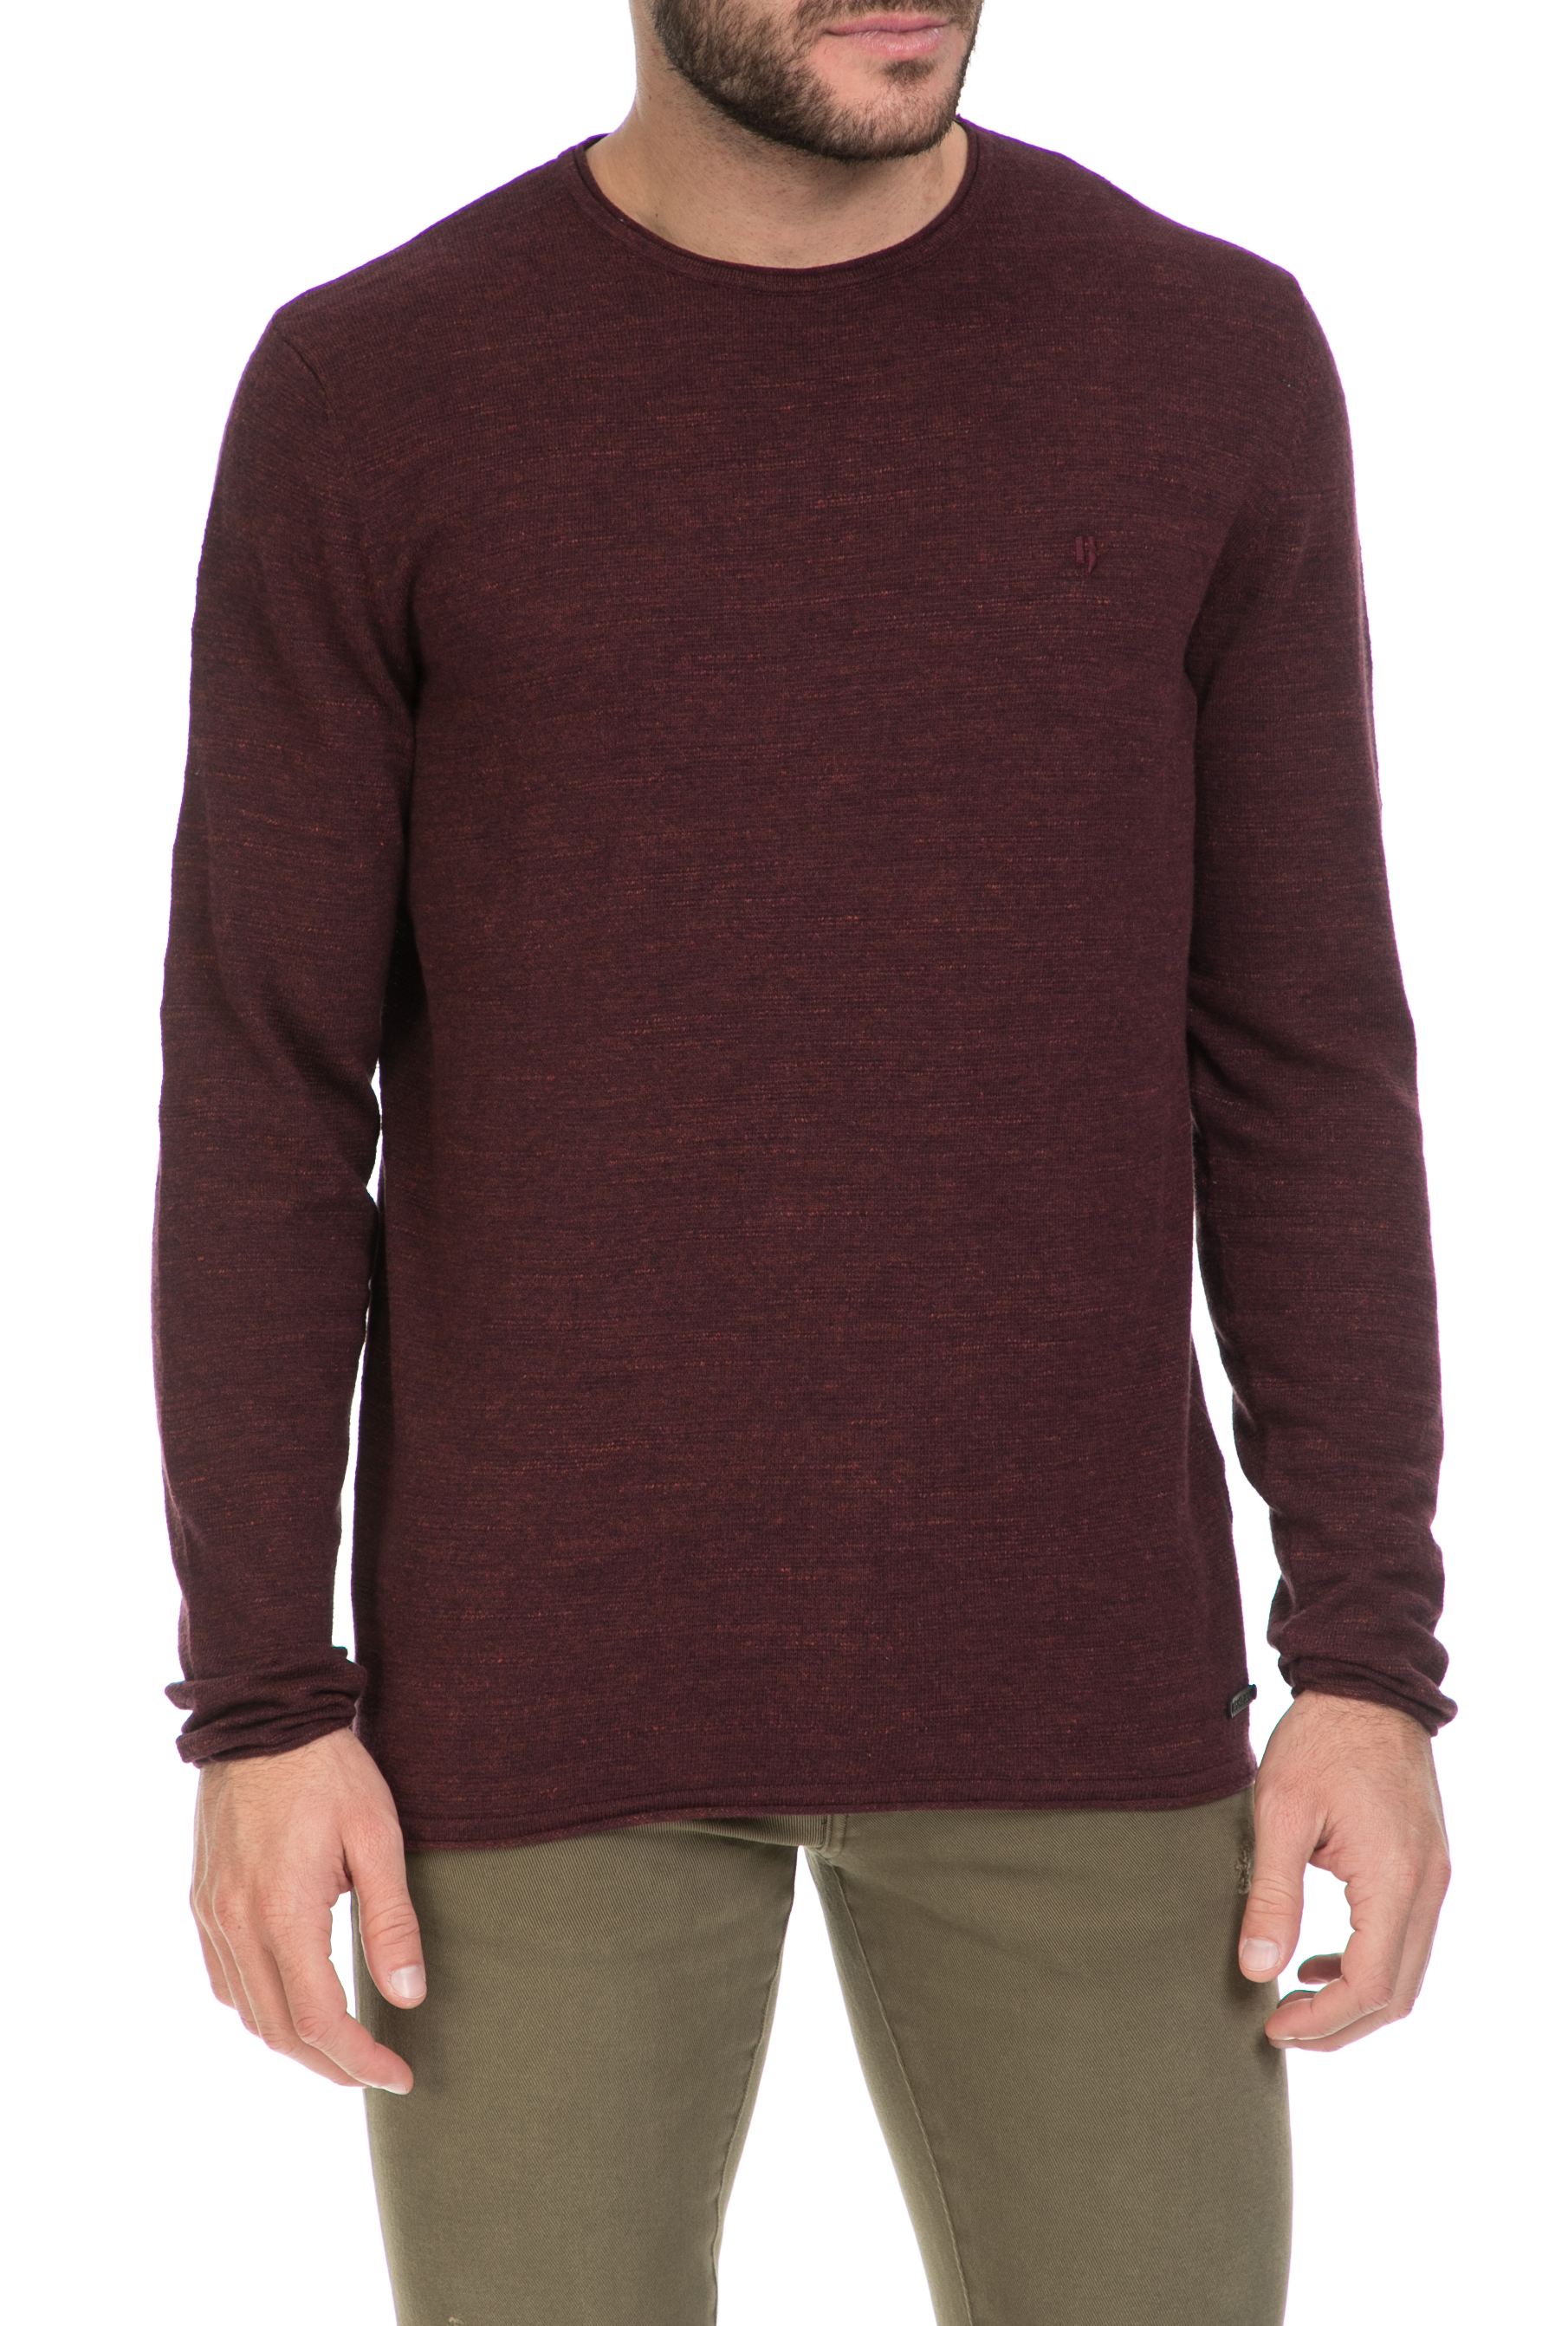 GARCIA JEANS - Ανδρικό πουλόβερ GARCIA JEANS μπορντό ανδρικά ρούχα πλεκτά ζακέτες μπλούζες